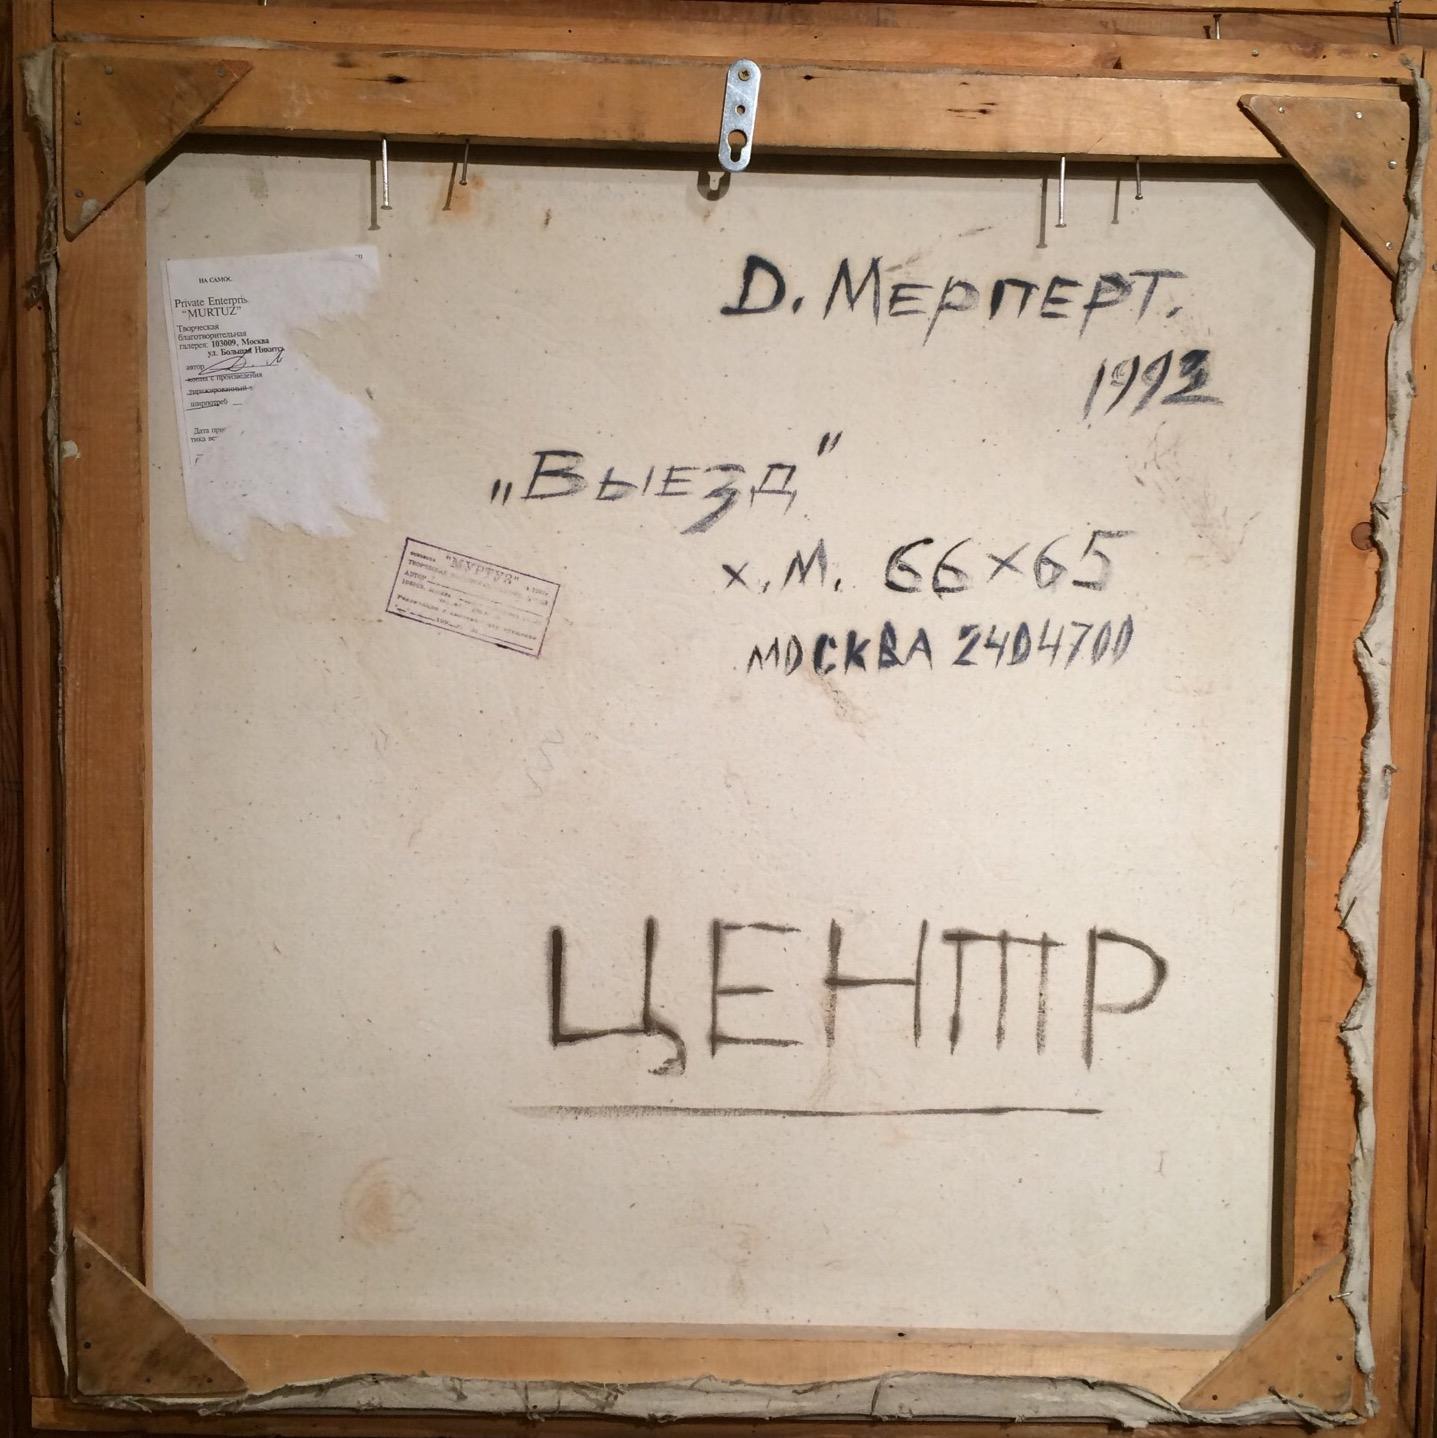 Оборот. Мерперт Дмитрий Маврикиевич. Выезд.